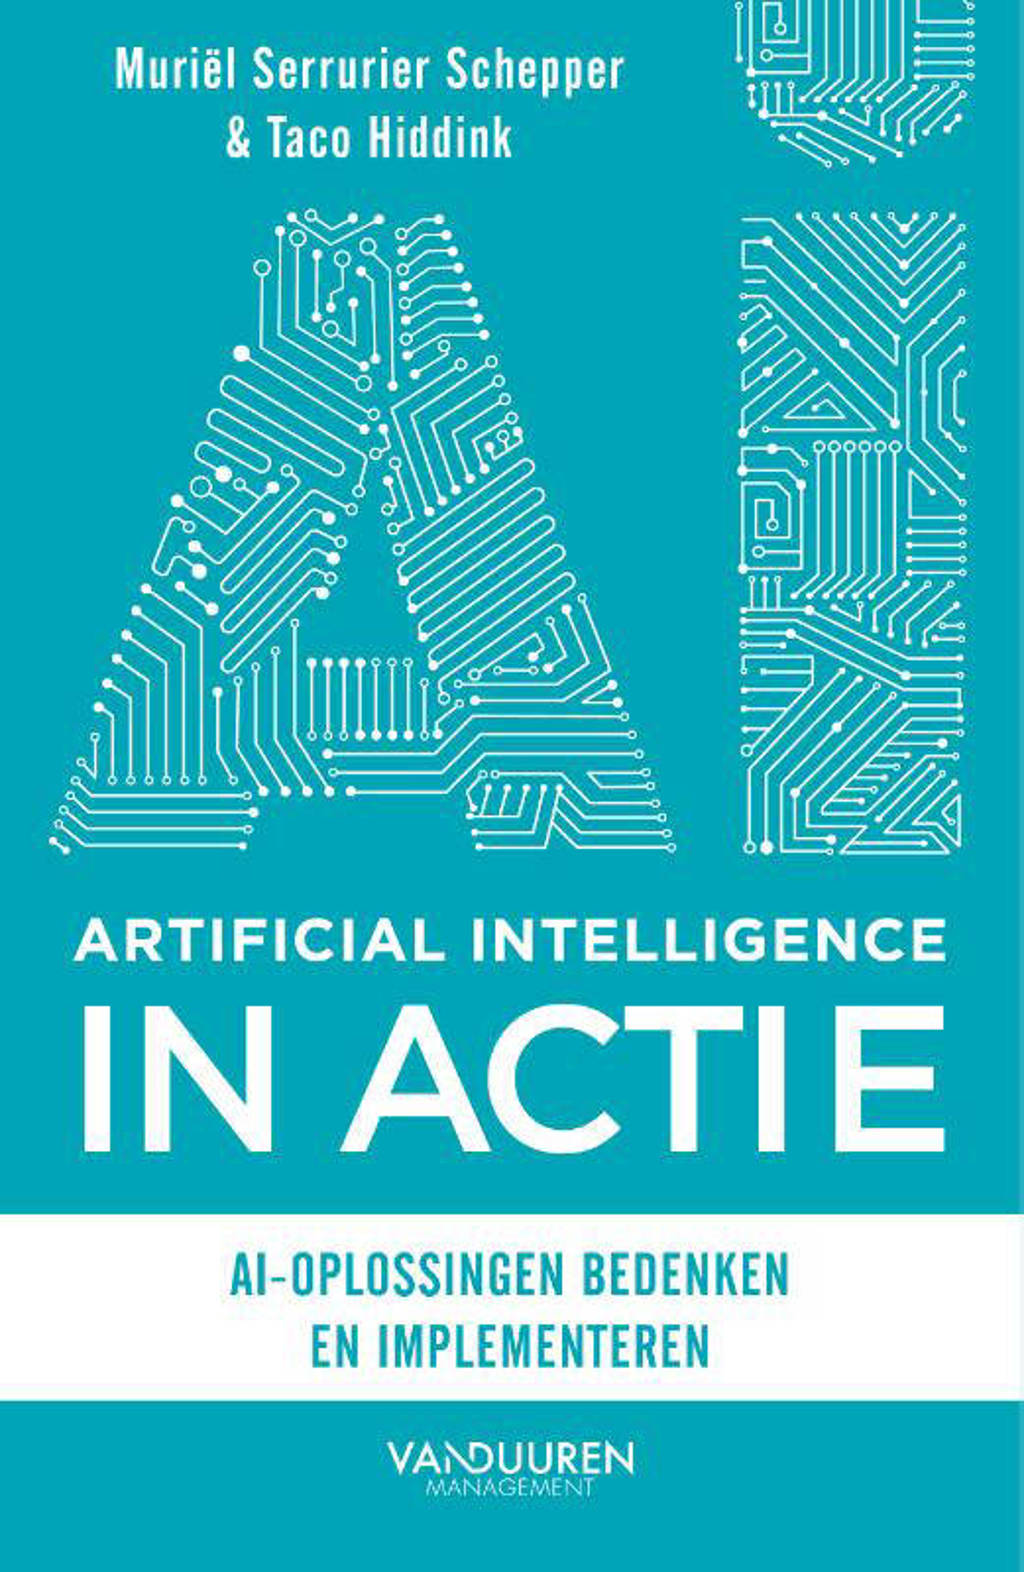 Artificial Intelligence in actie - Muriël Serrurier Schepper en Taco Hiddink